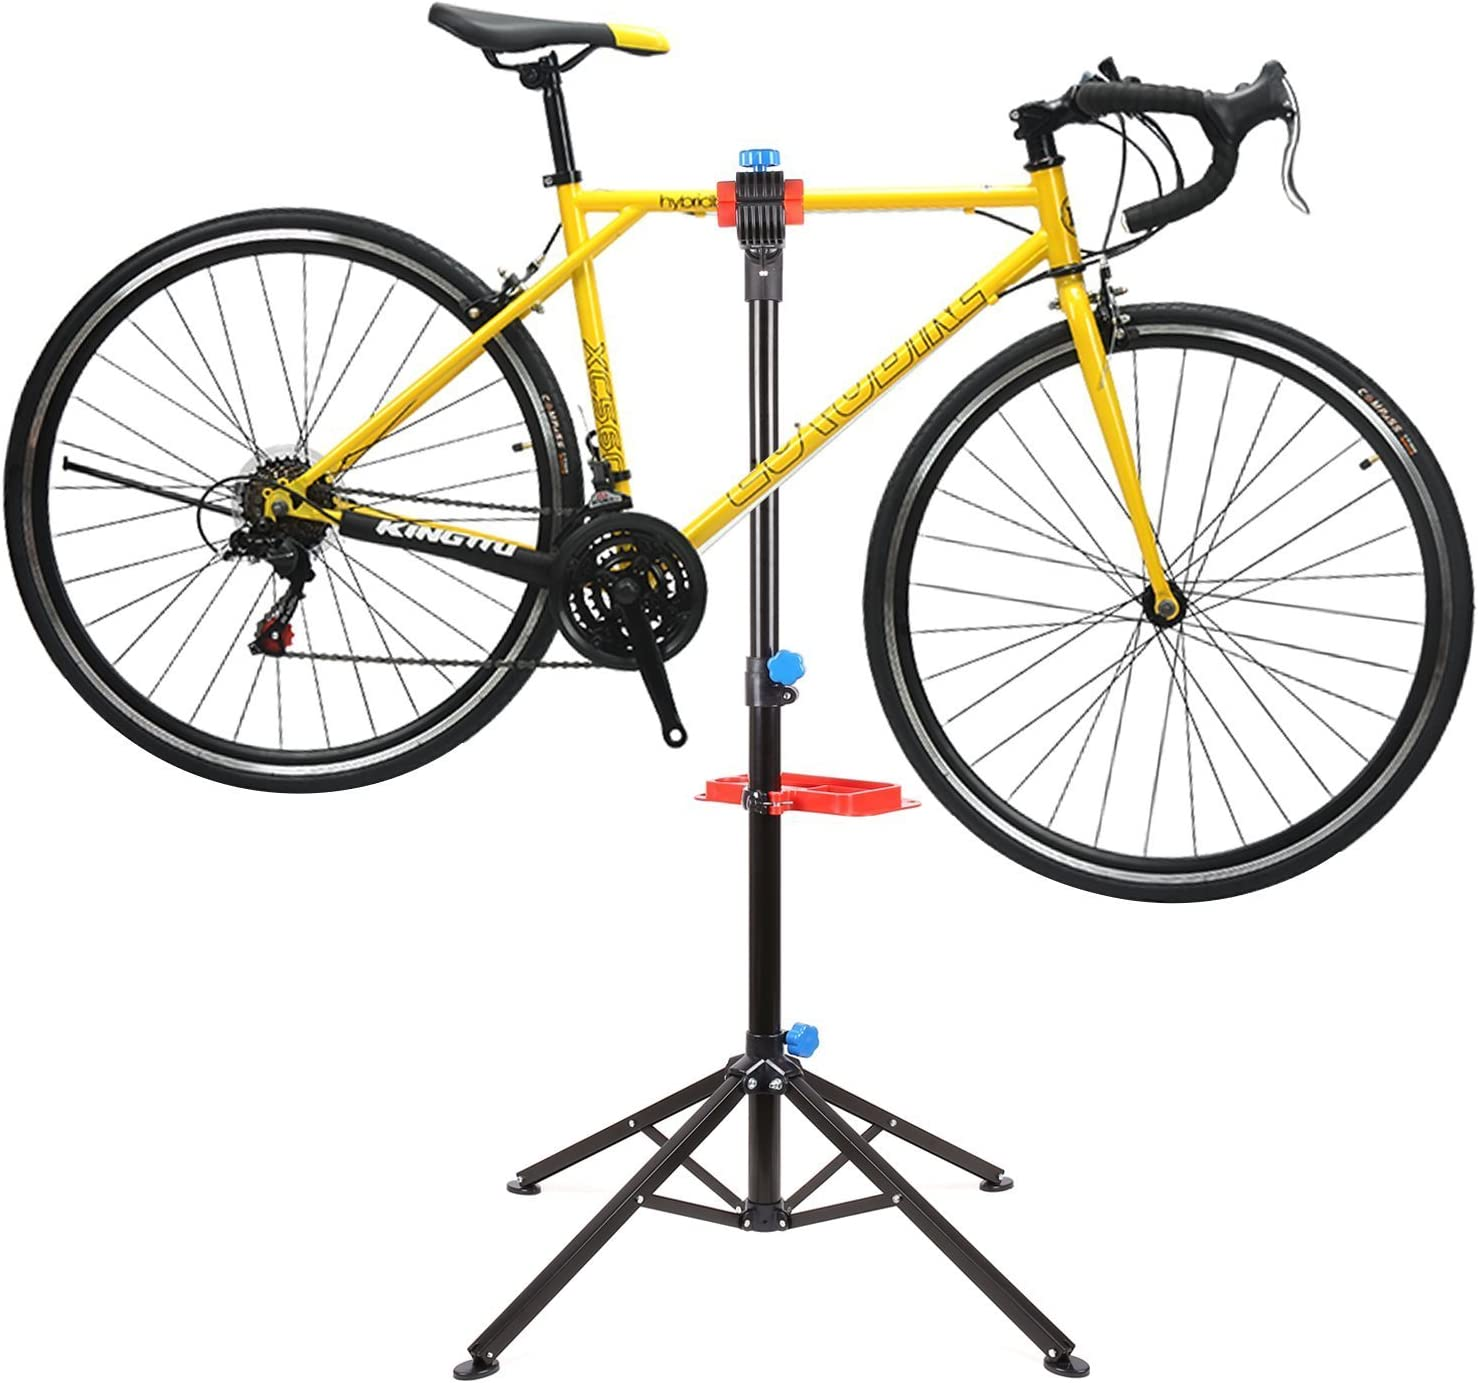 Femor Soporte caballete bicicleta Stand bicicleta para ...